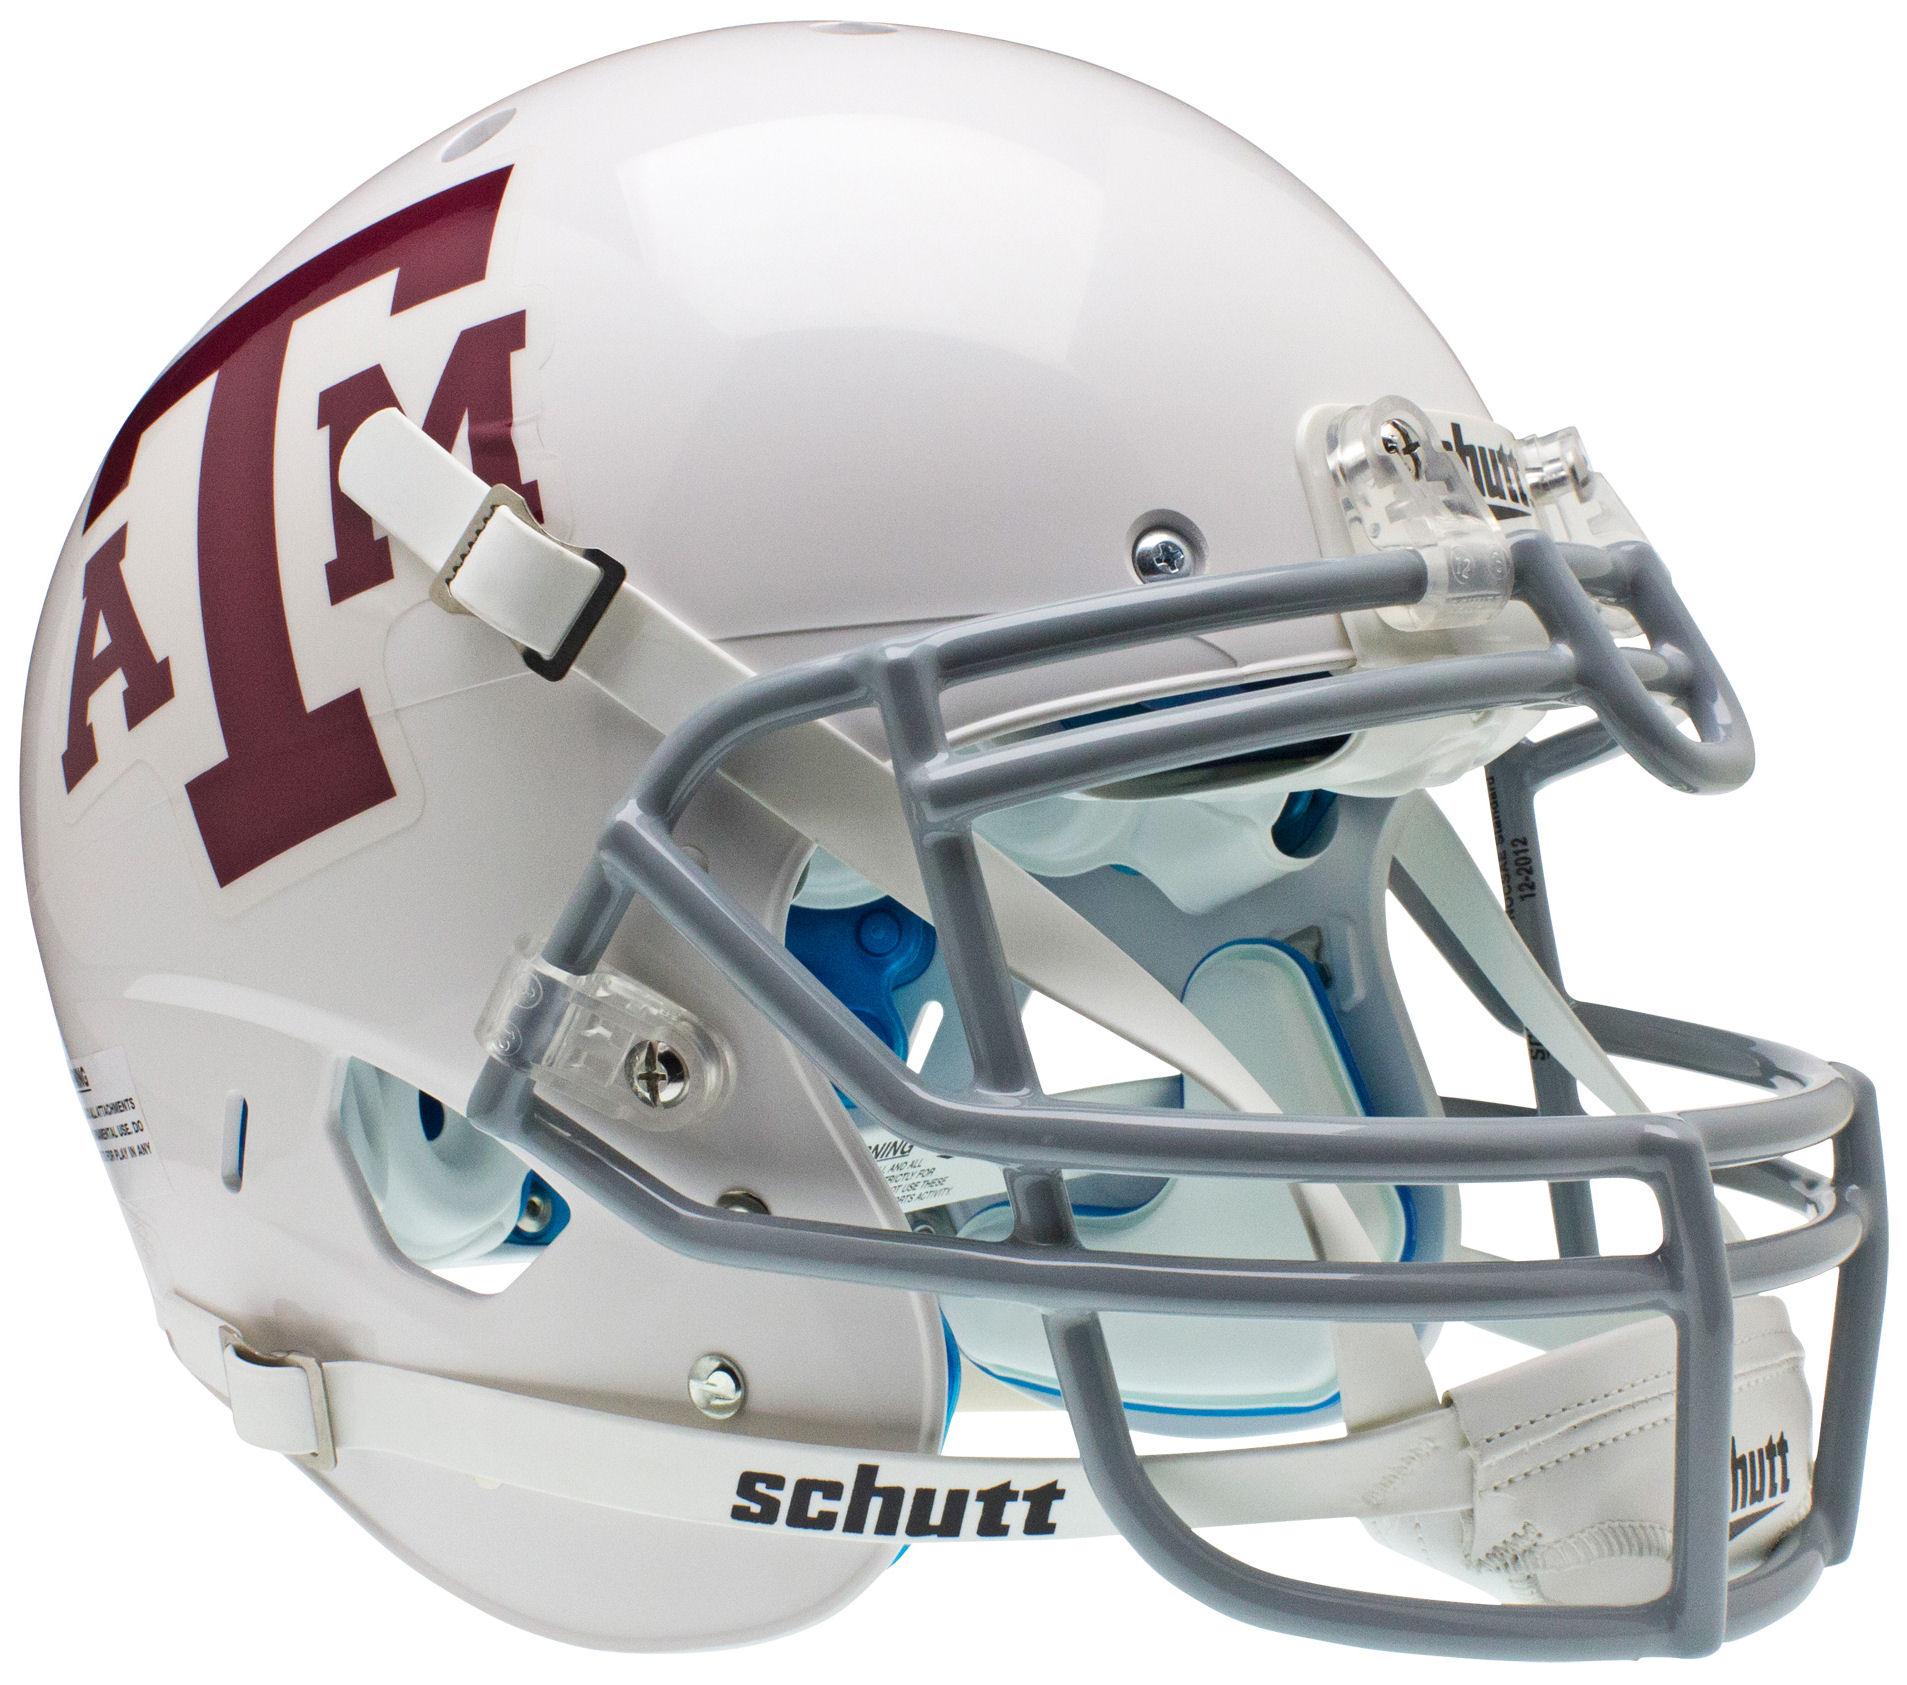 Texas A&M Aggies Authentic College XP Football Helmet Schutt <B>White Gray Mask</B>